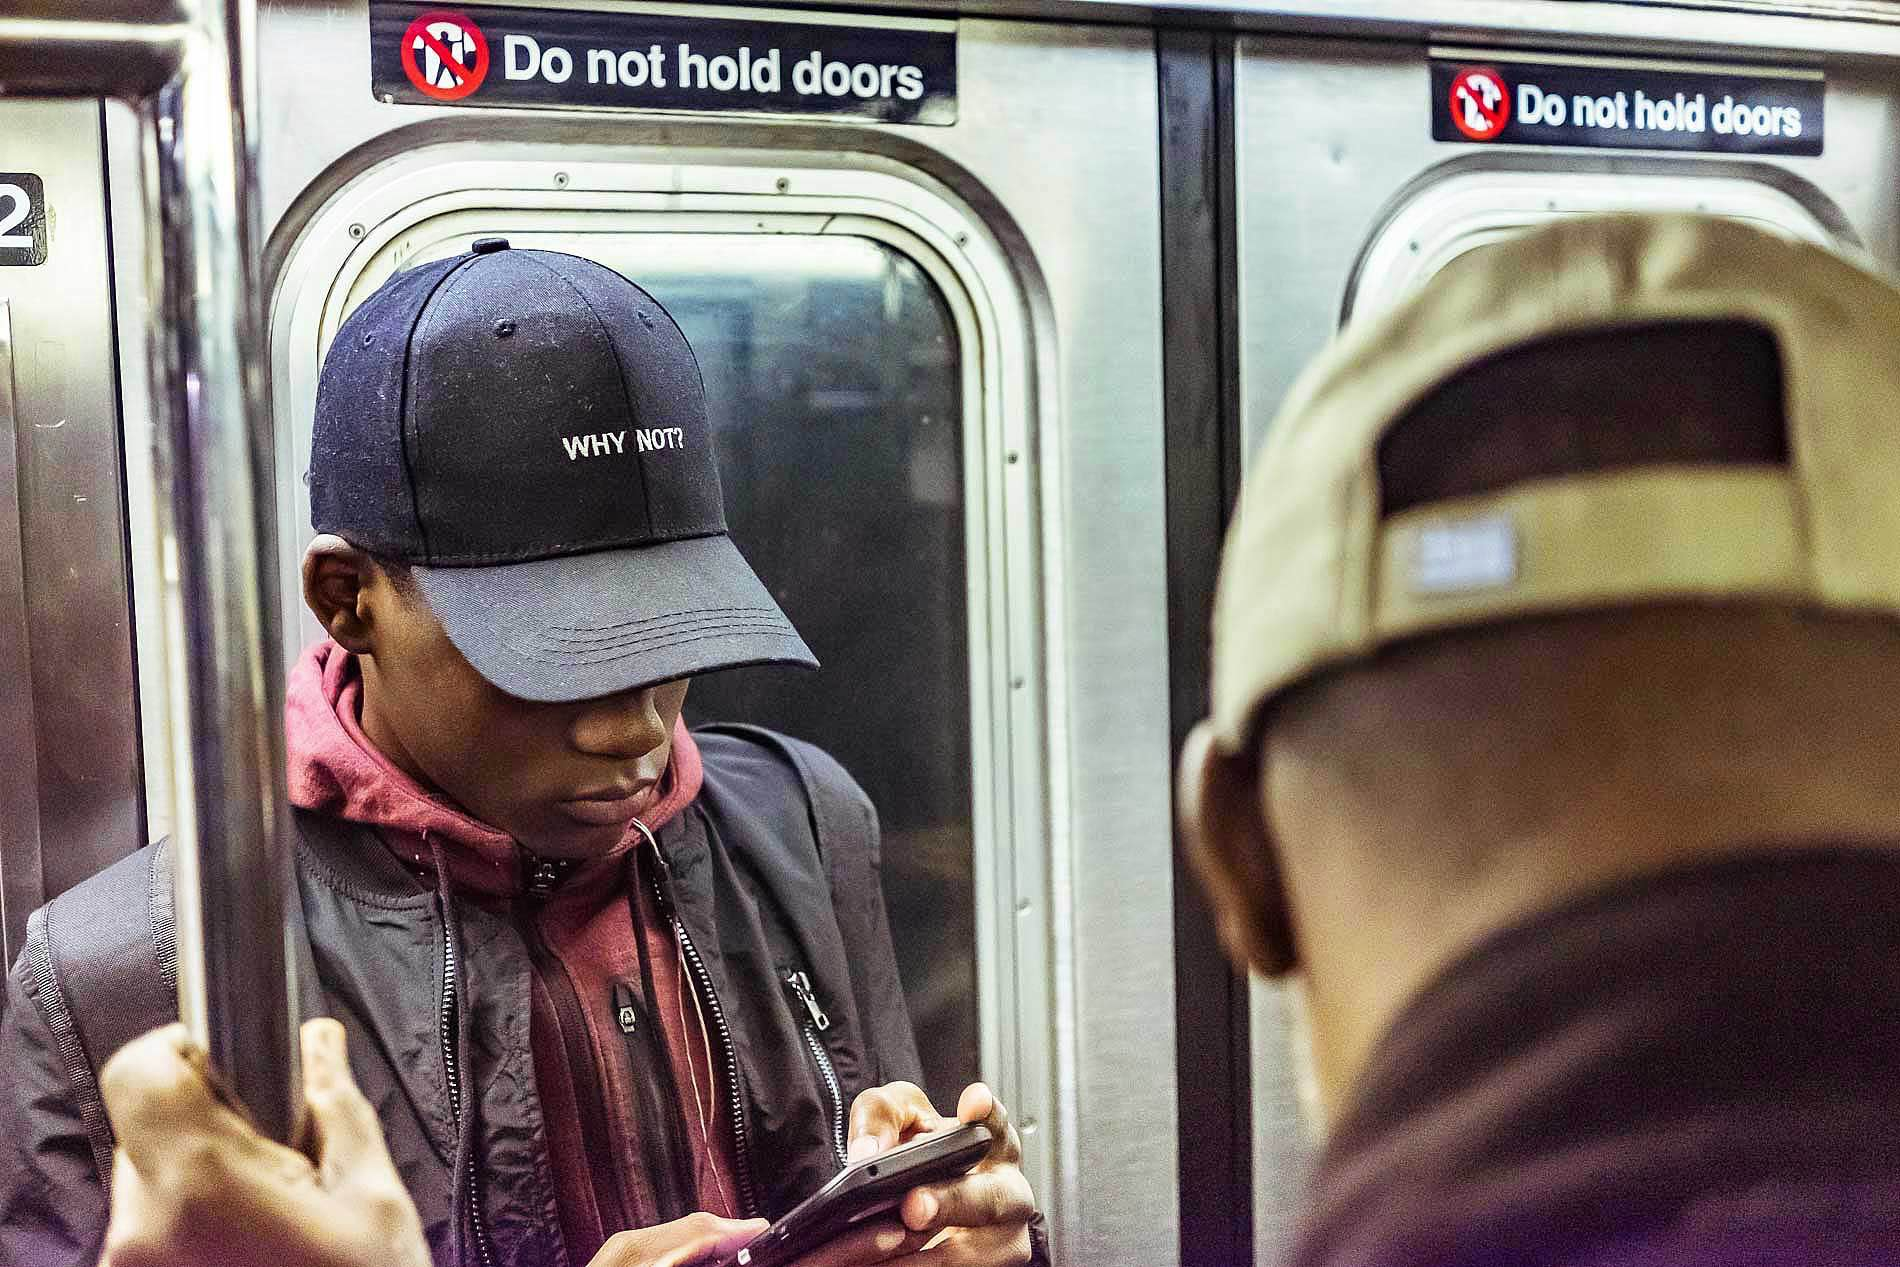 reportage_travel_newyork_martinfrick-4751